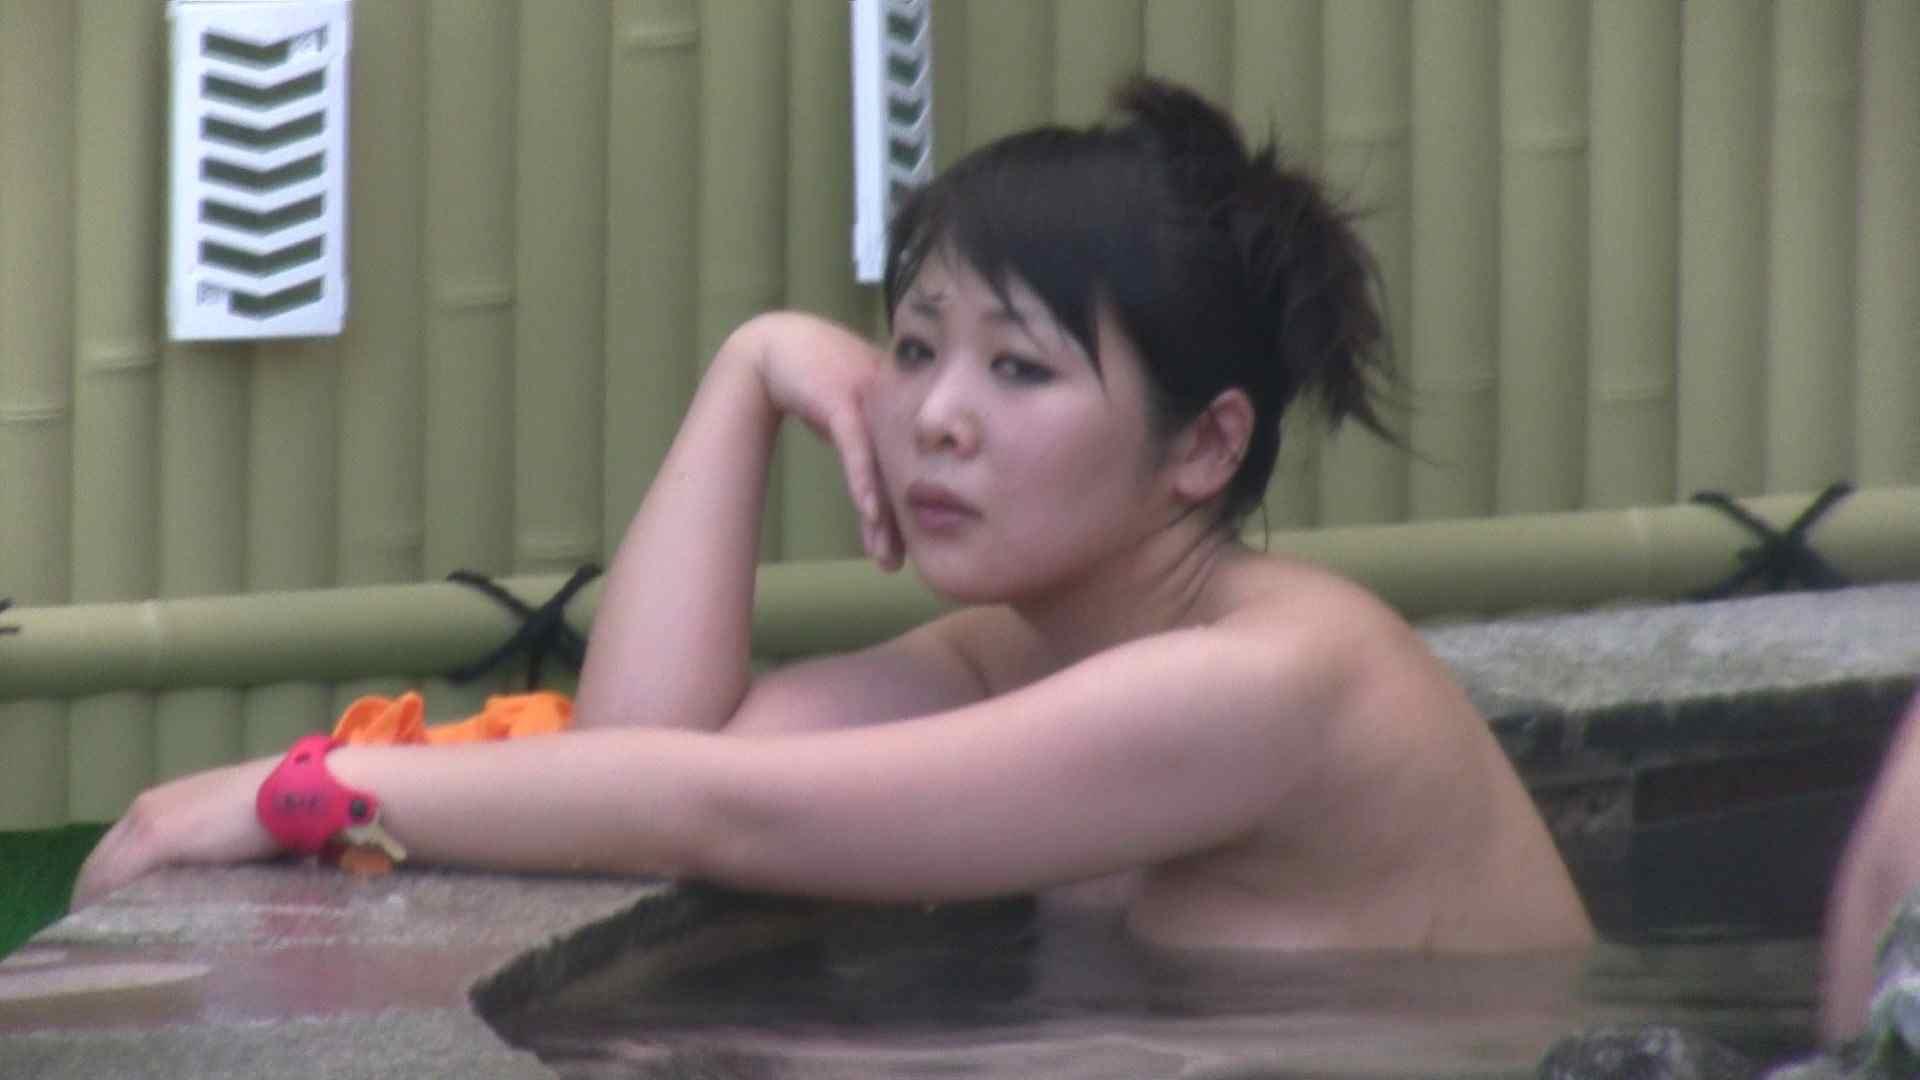 Aquaな露天風呂Vol.118 盗撮大放出 濡れ場動画紹介 85連発 79